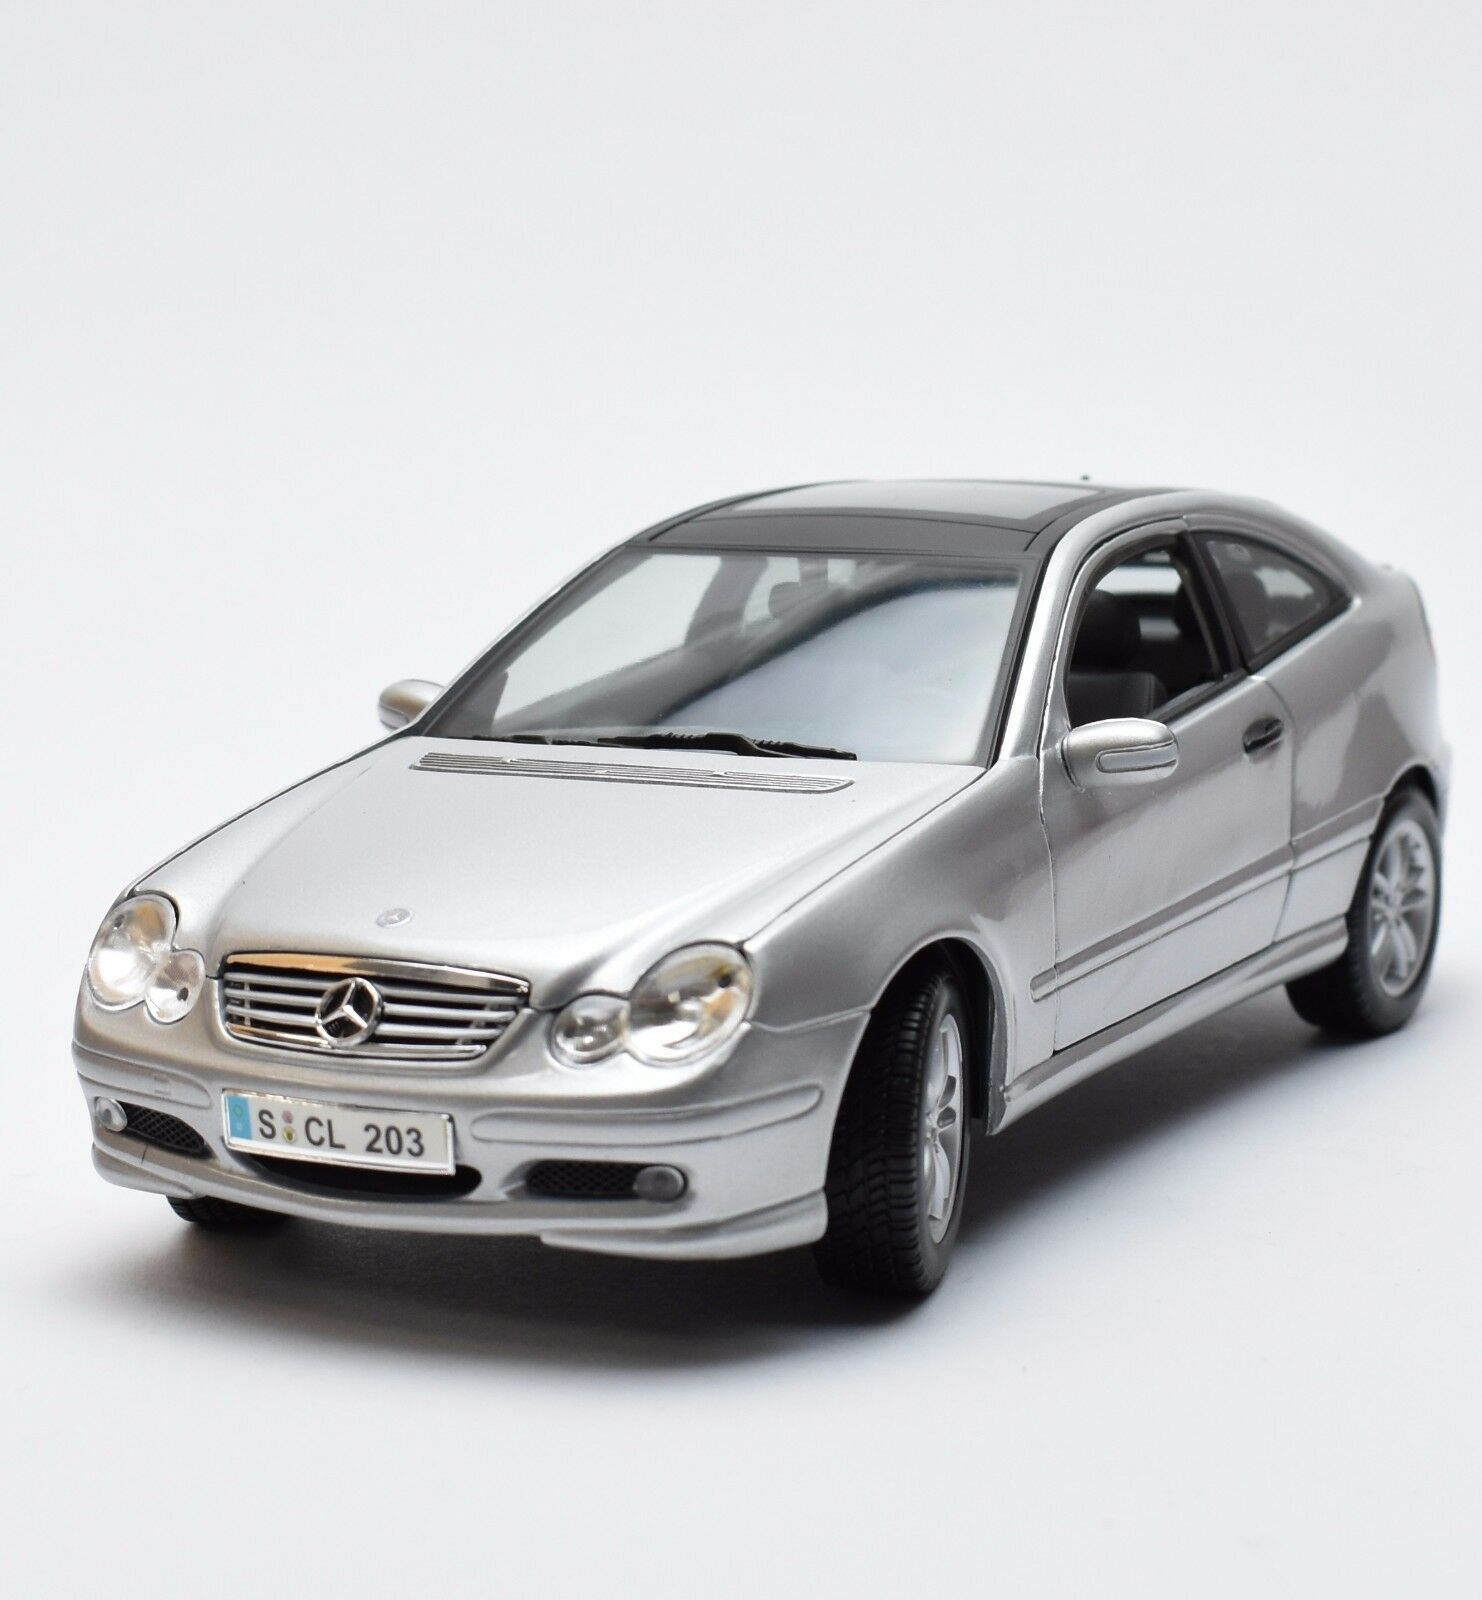 Colección de MB clase B 66962123 Mercedes Benz compresor C 1 18, OVP, K029